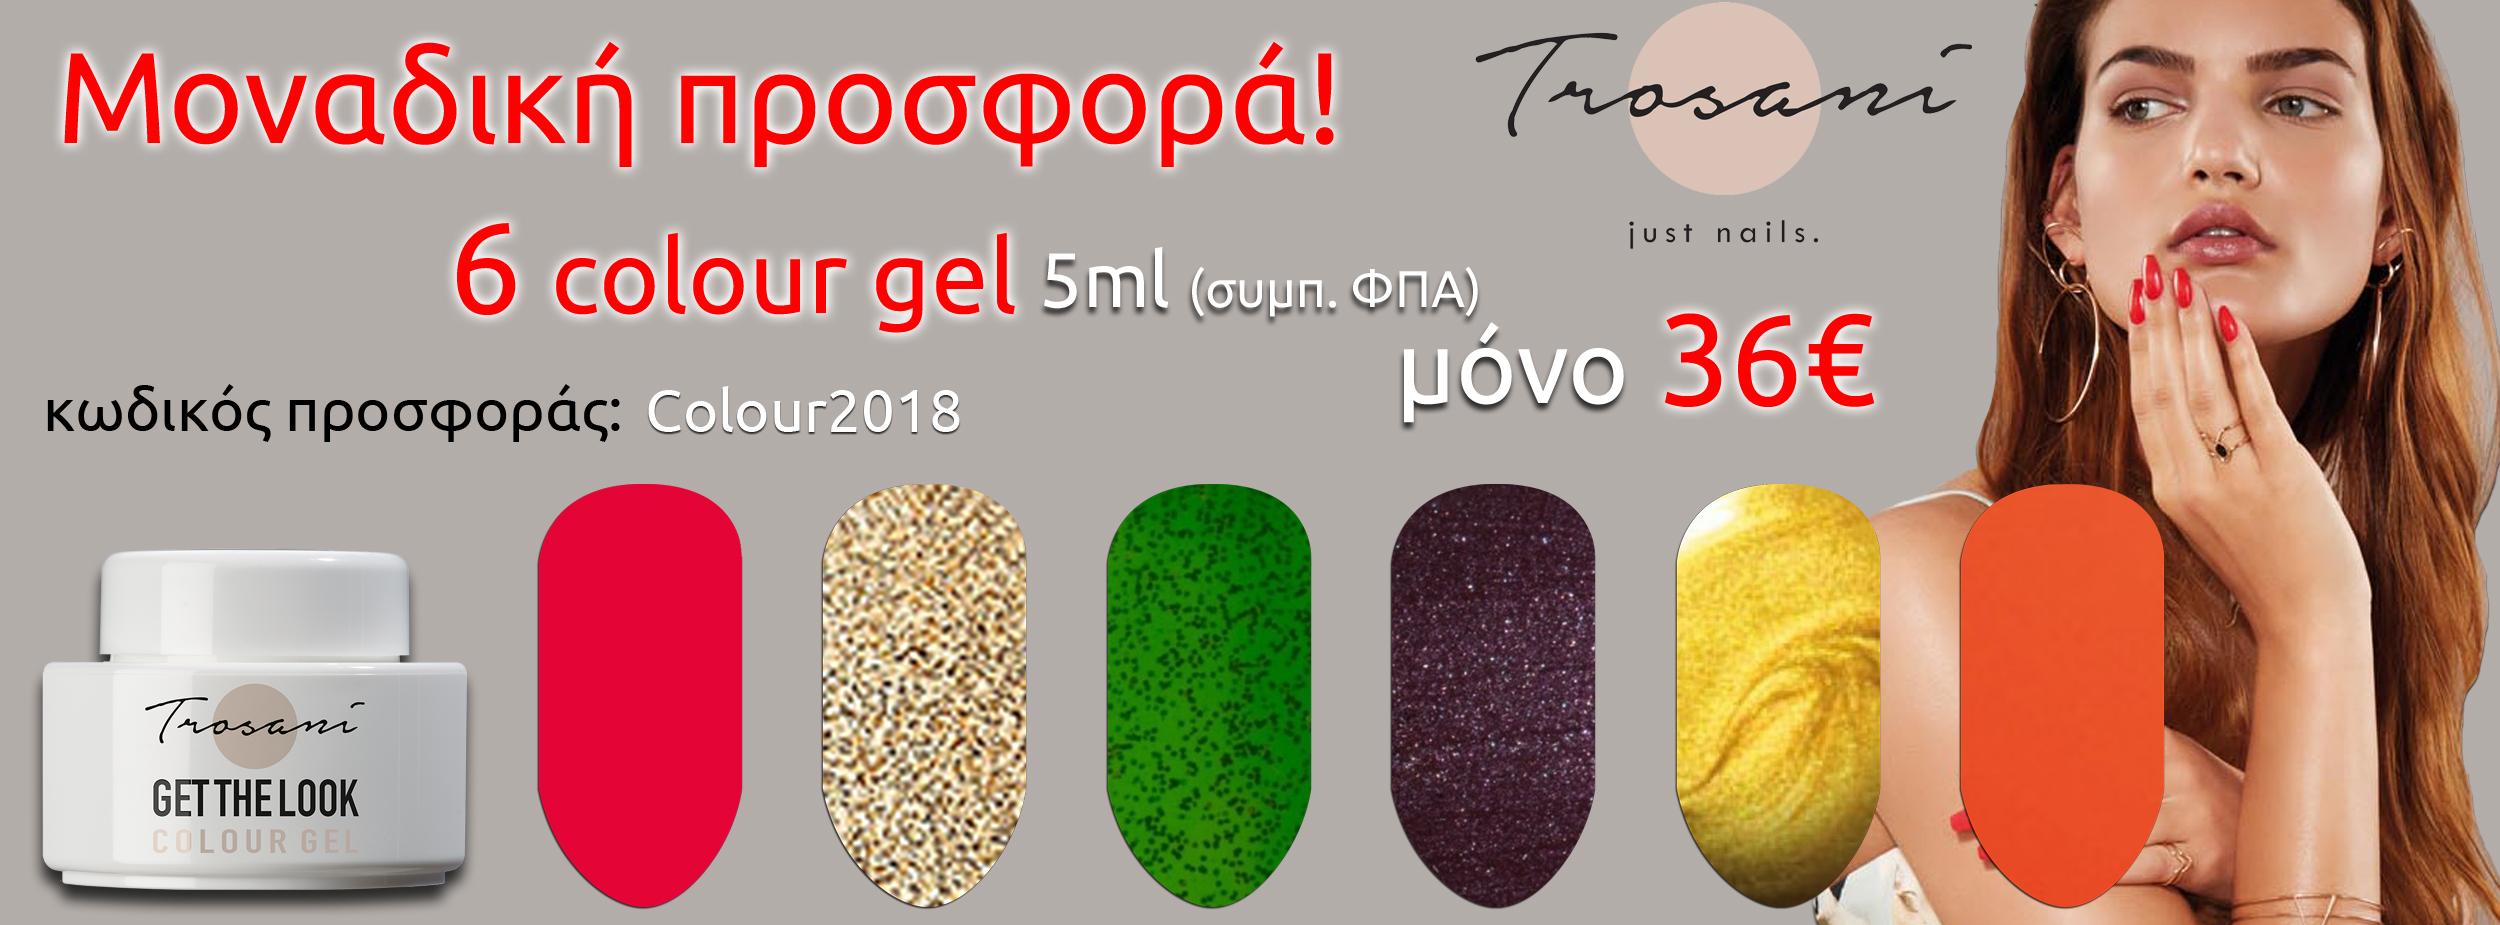 trosani 6 colour gel 36 euro